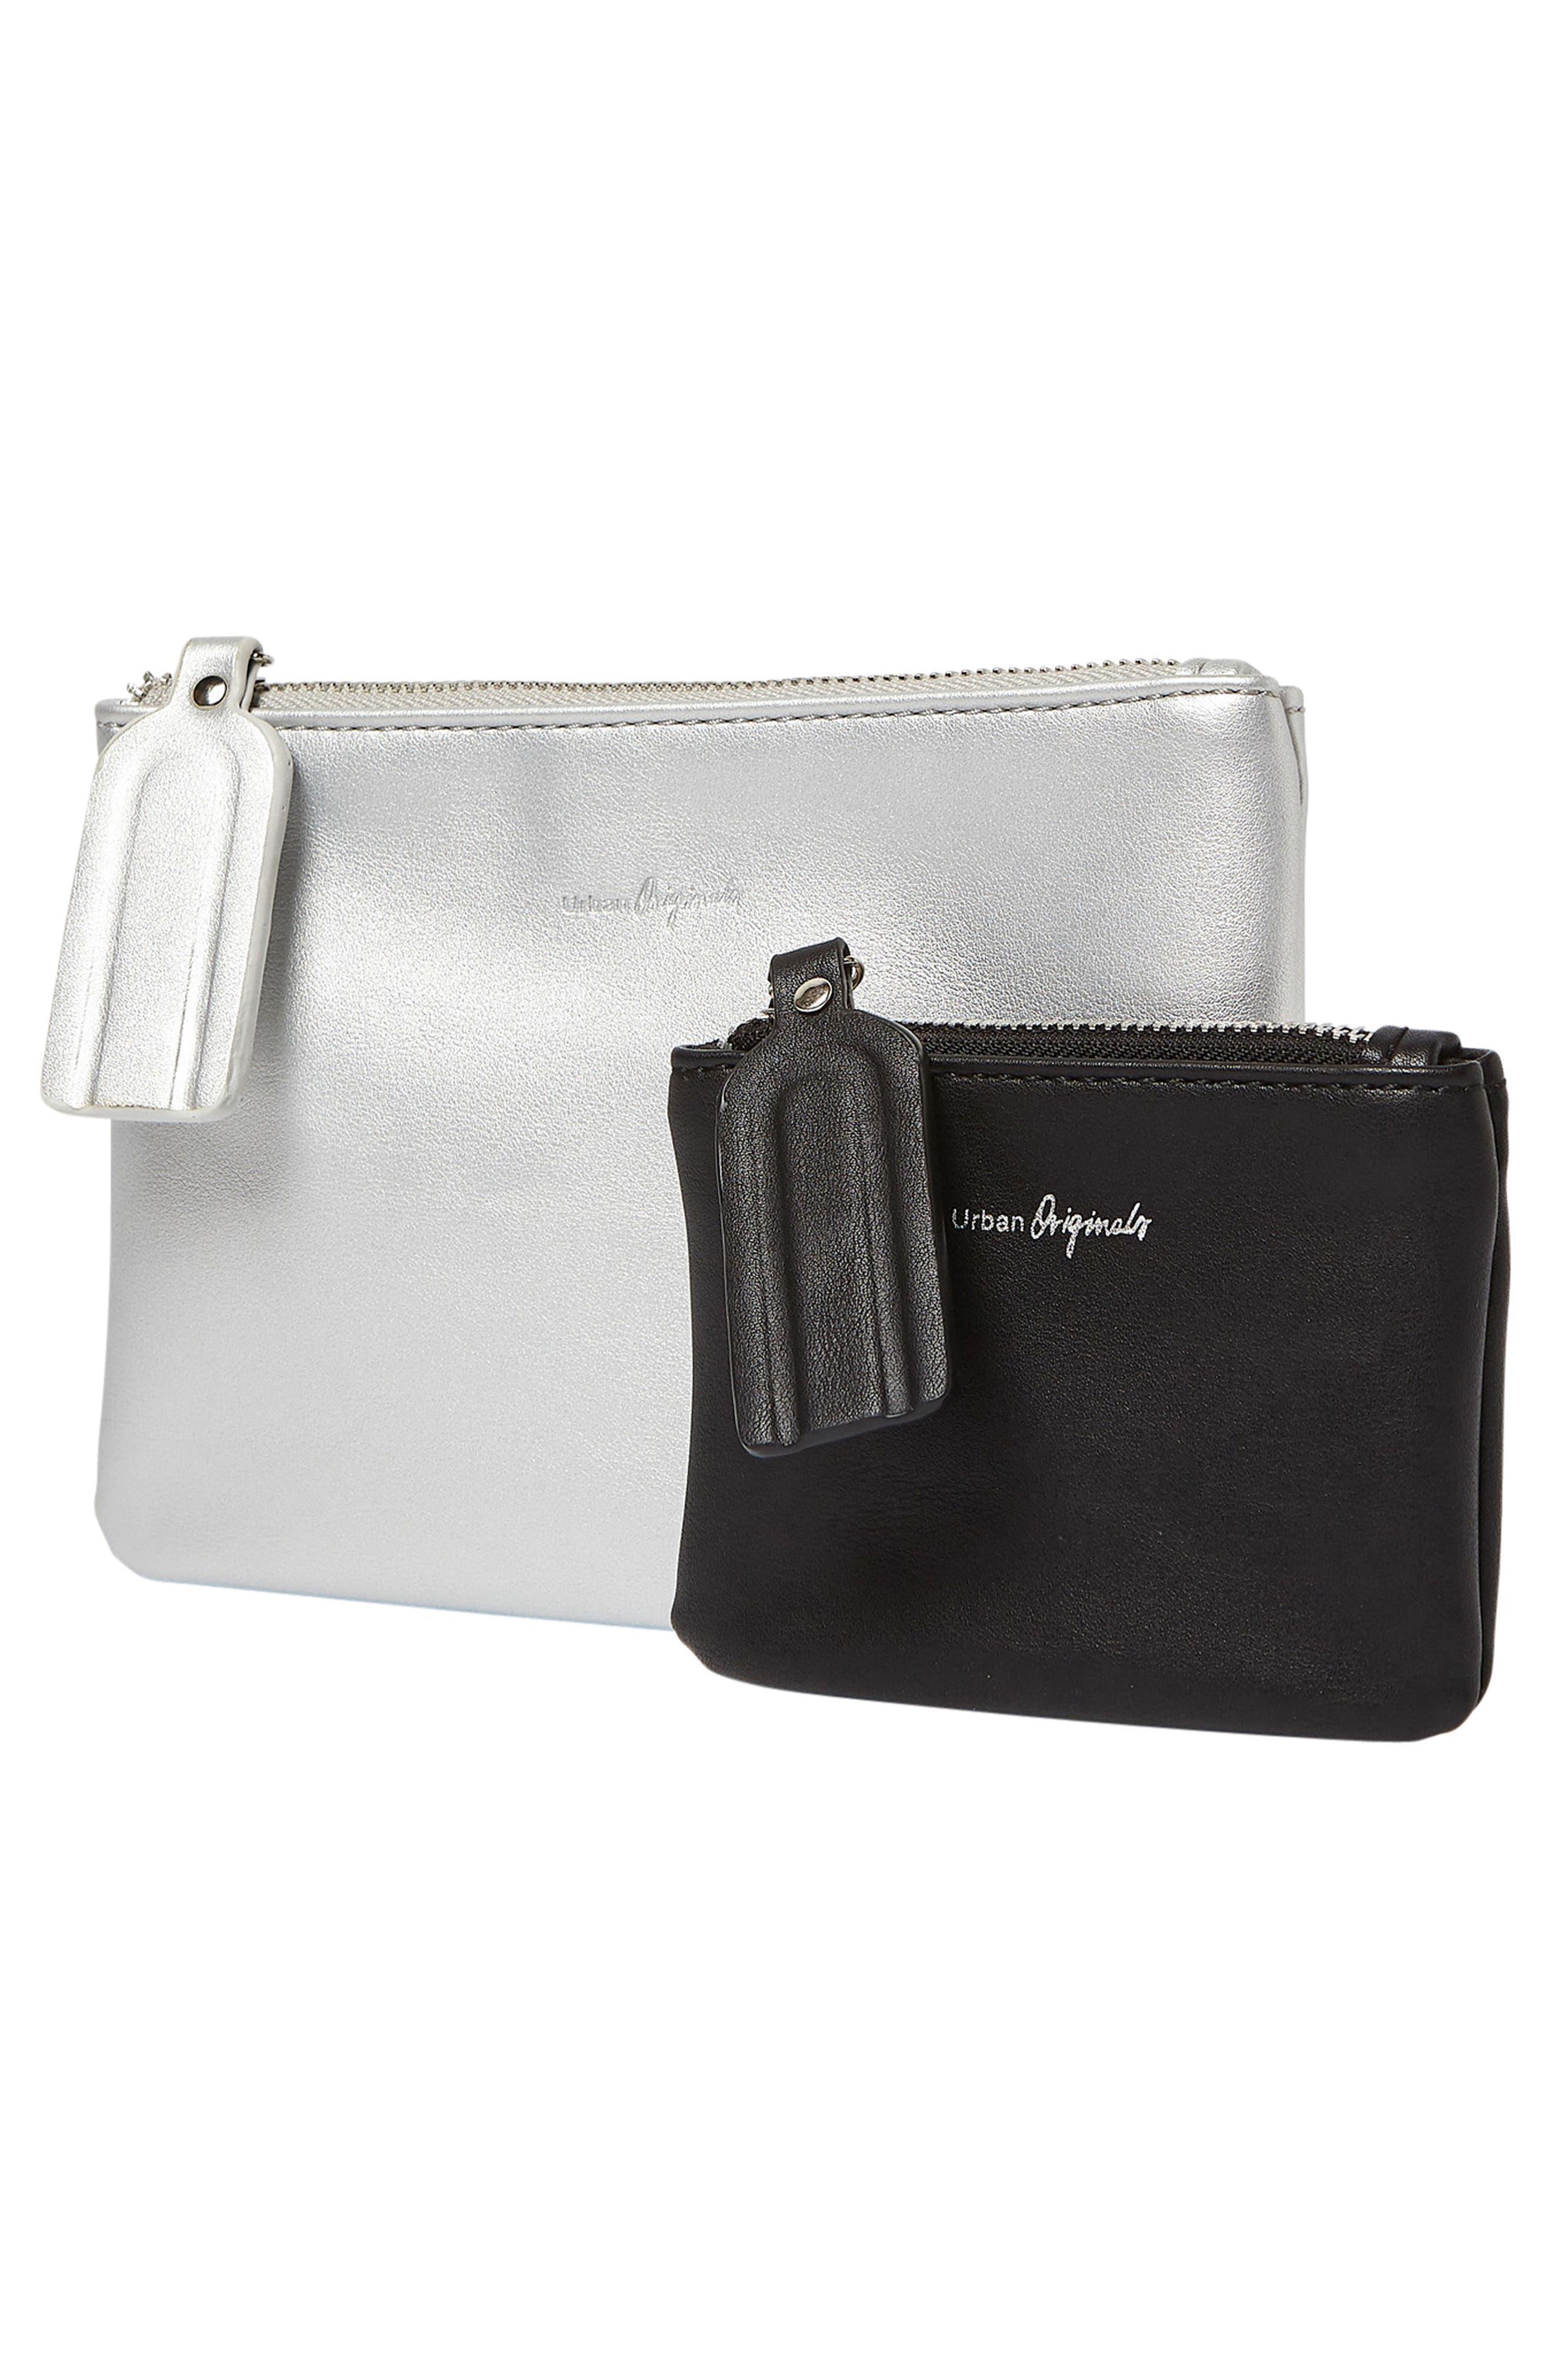 Dreamer 2-Pack Vegan Leather Card Cases,                             Alternate thumbnail 2, color,                             Black/ Silver